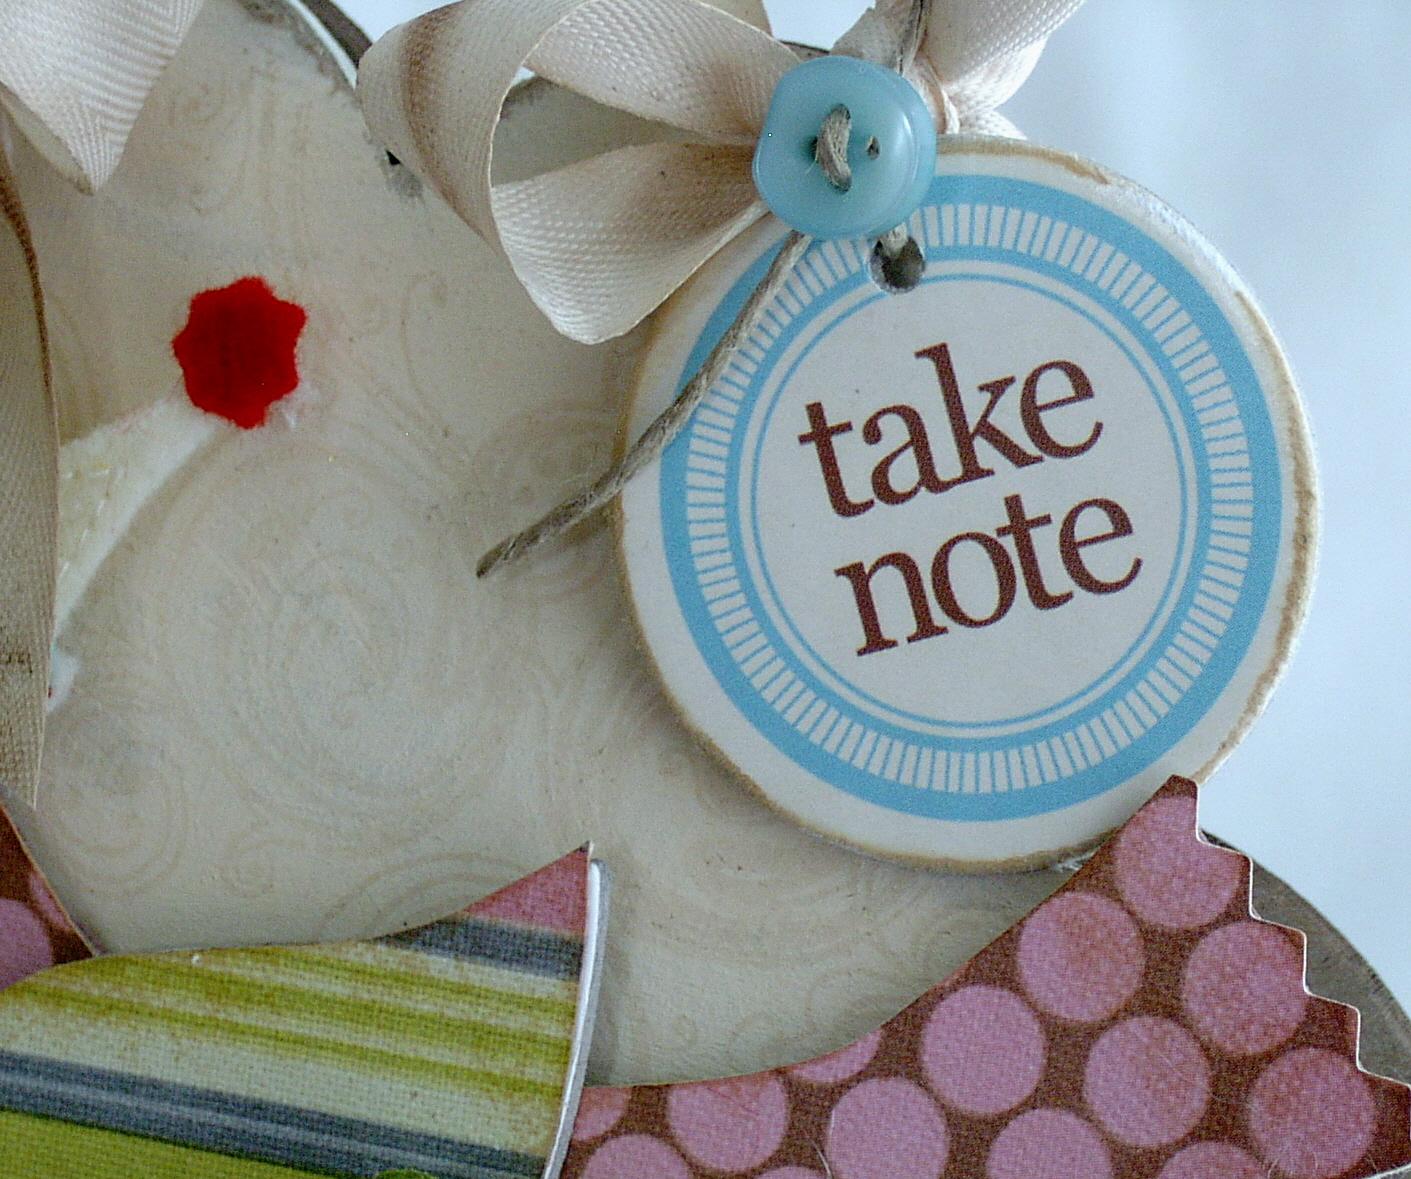 Takenote8